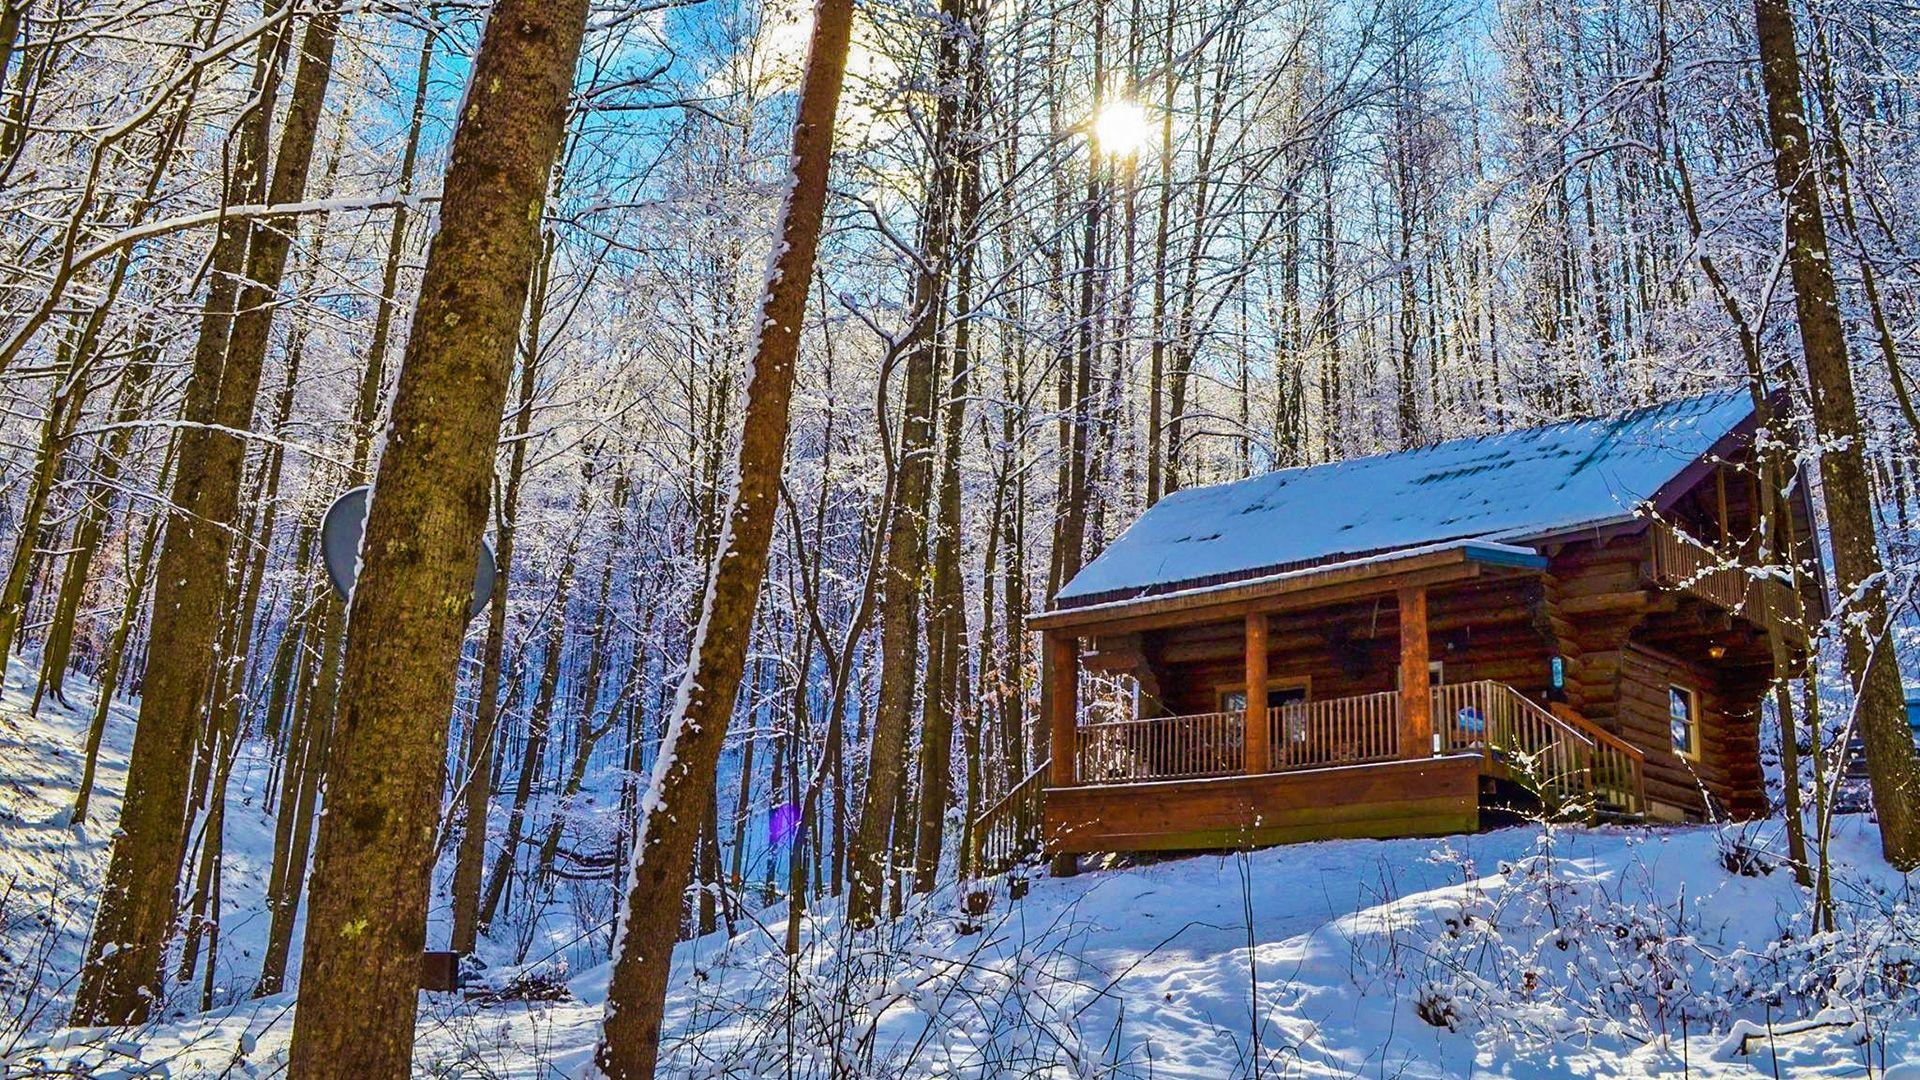 Elkins Pass Cabin in Winter